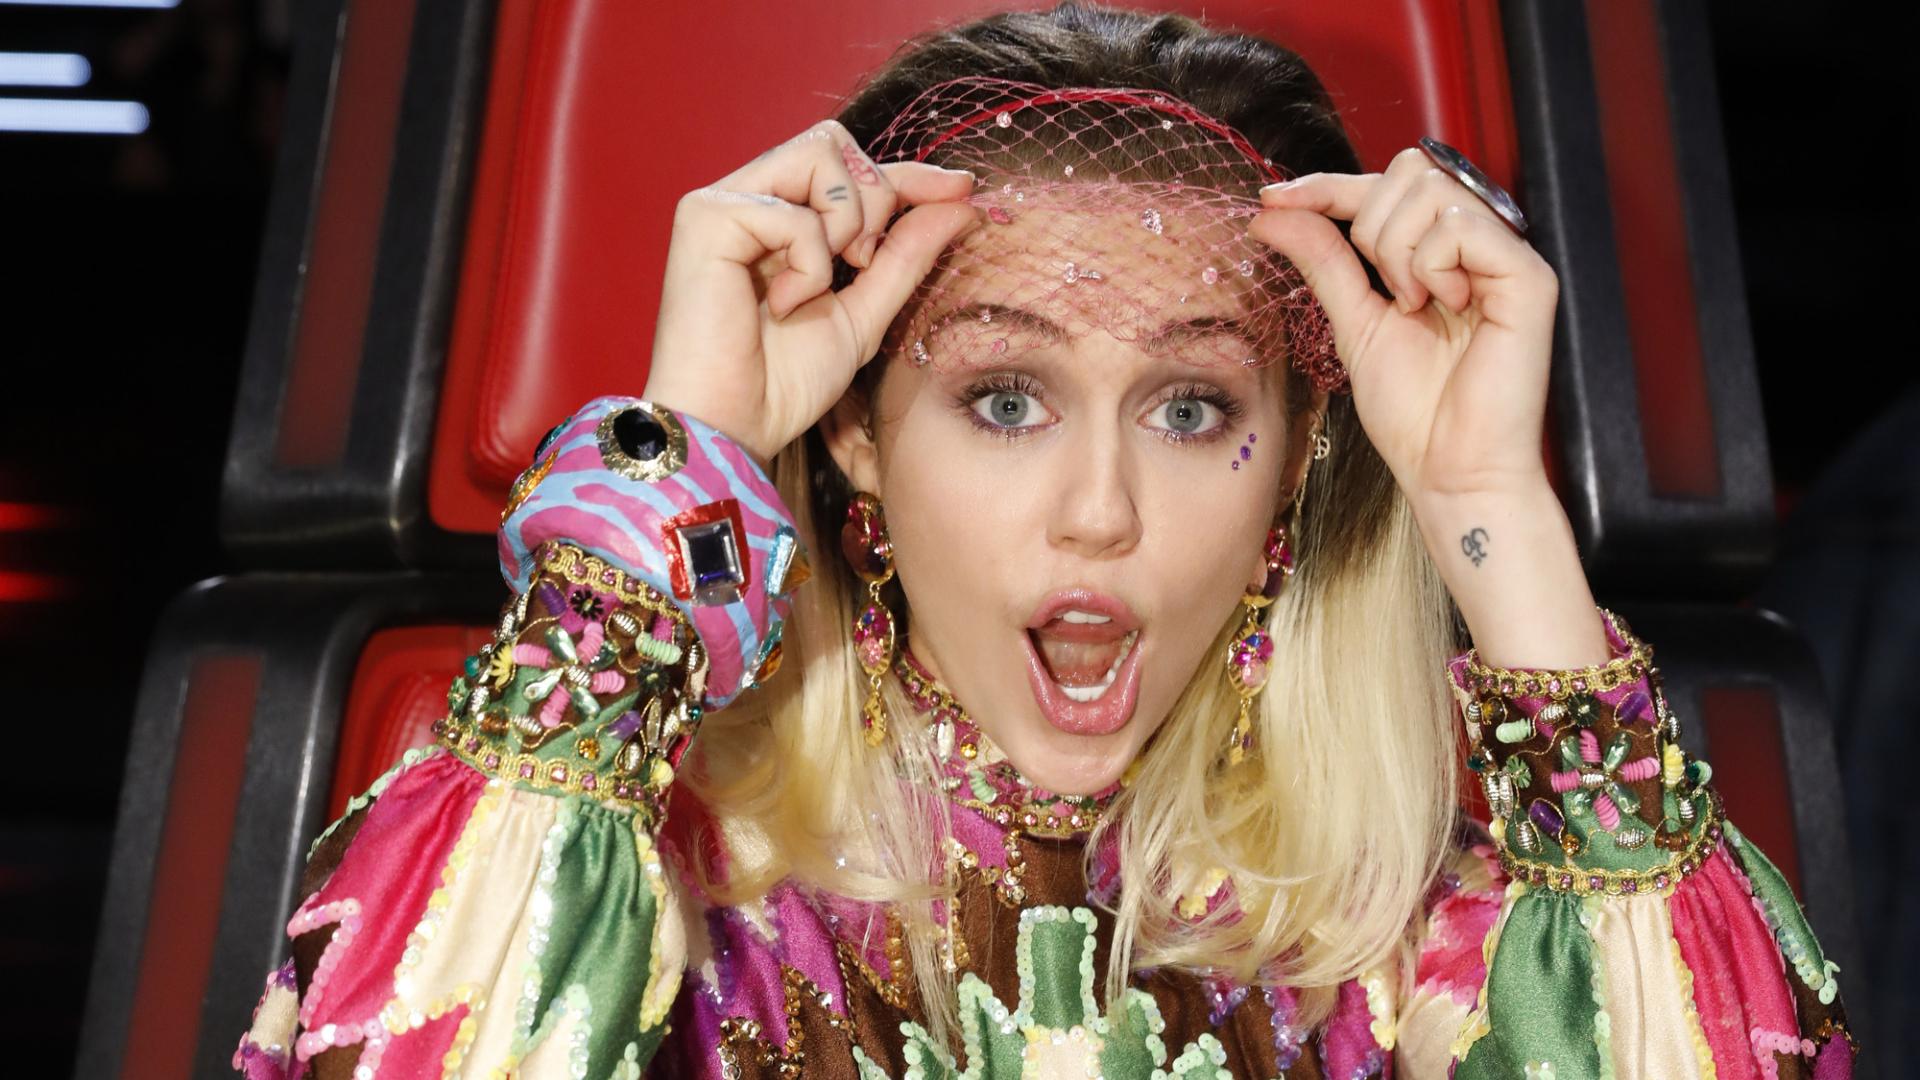 Miley Cyrus Hot wallpaper | celebrities | Wallpaper Better